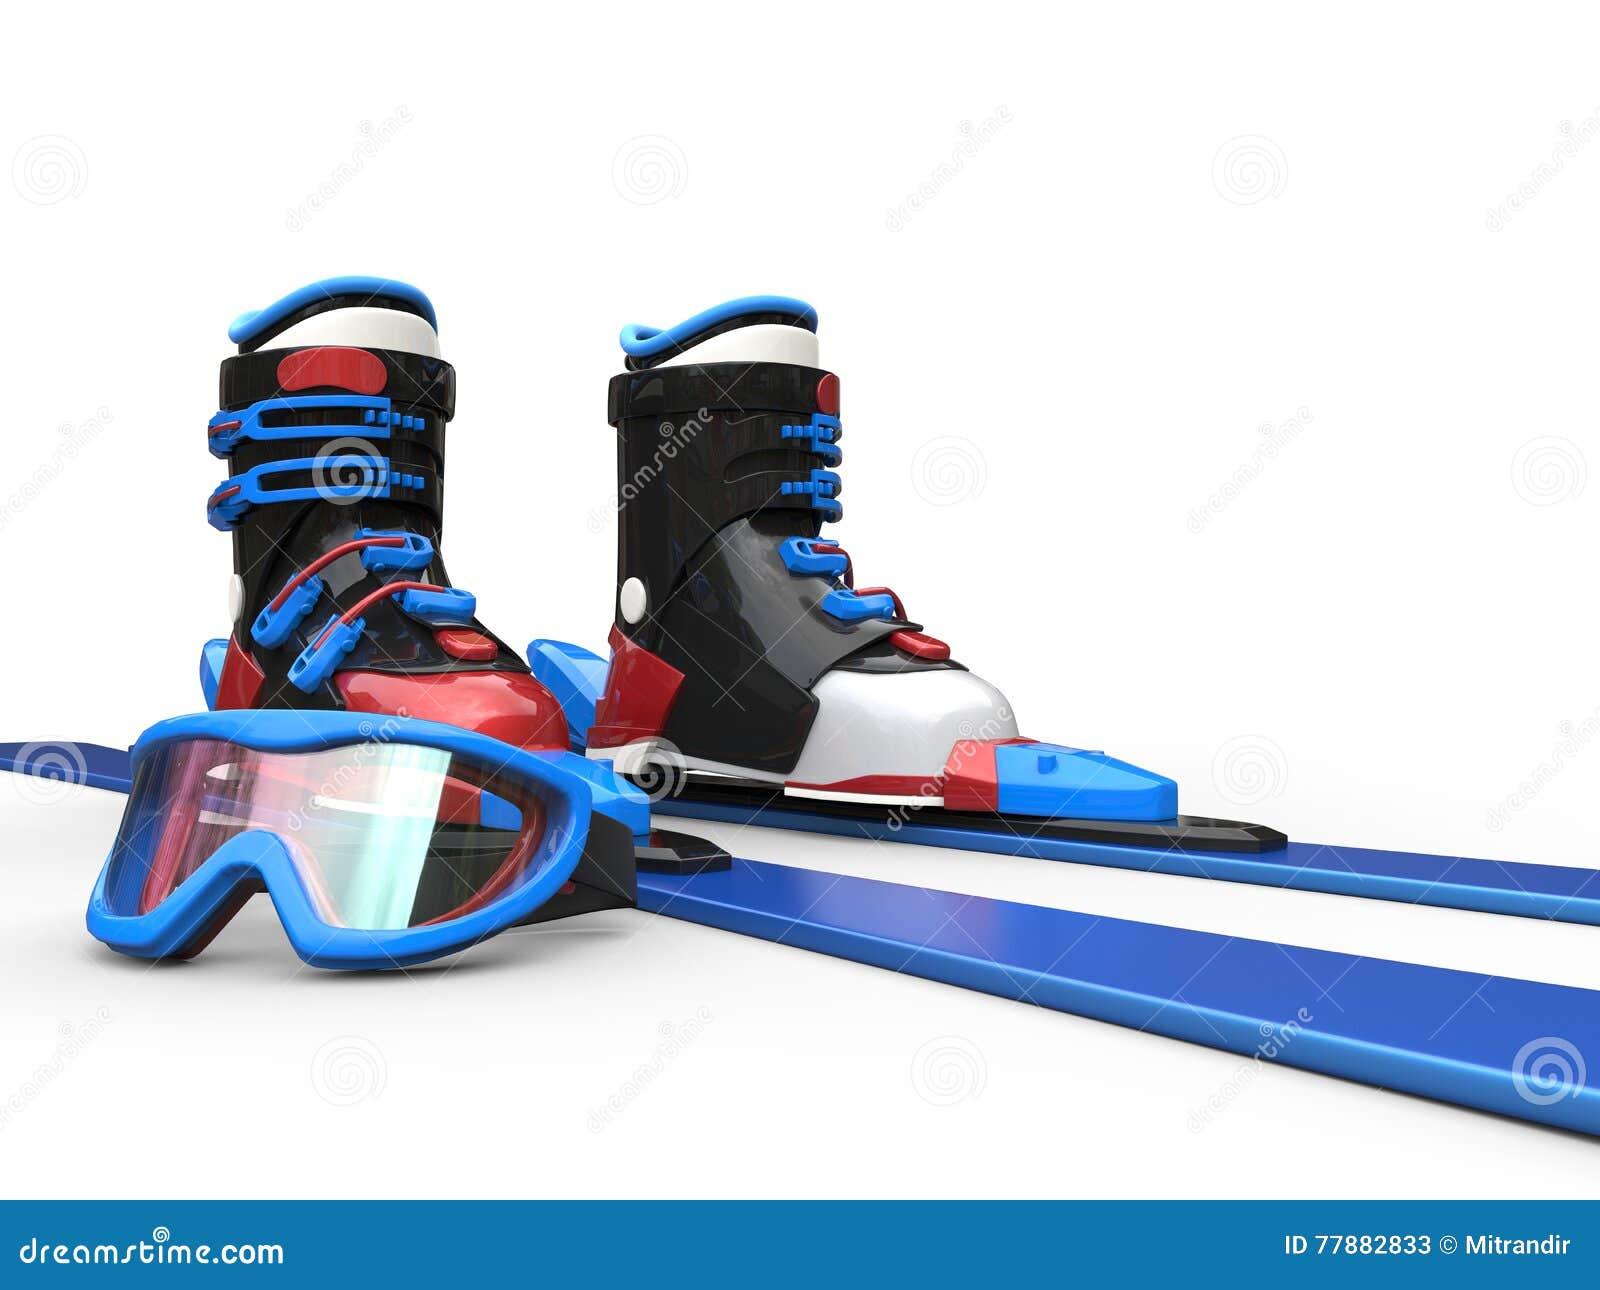 Skiis Azules Con Las Gafas Bordeadas Azul Del Esquí Stock de ilustración